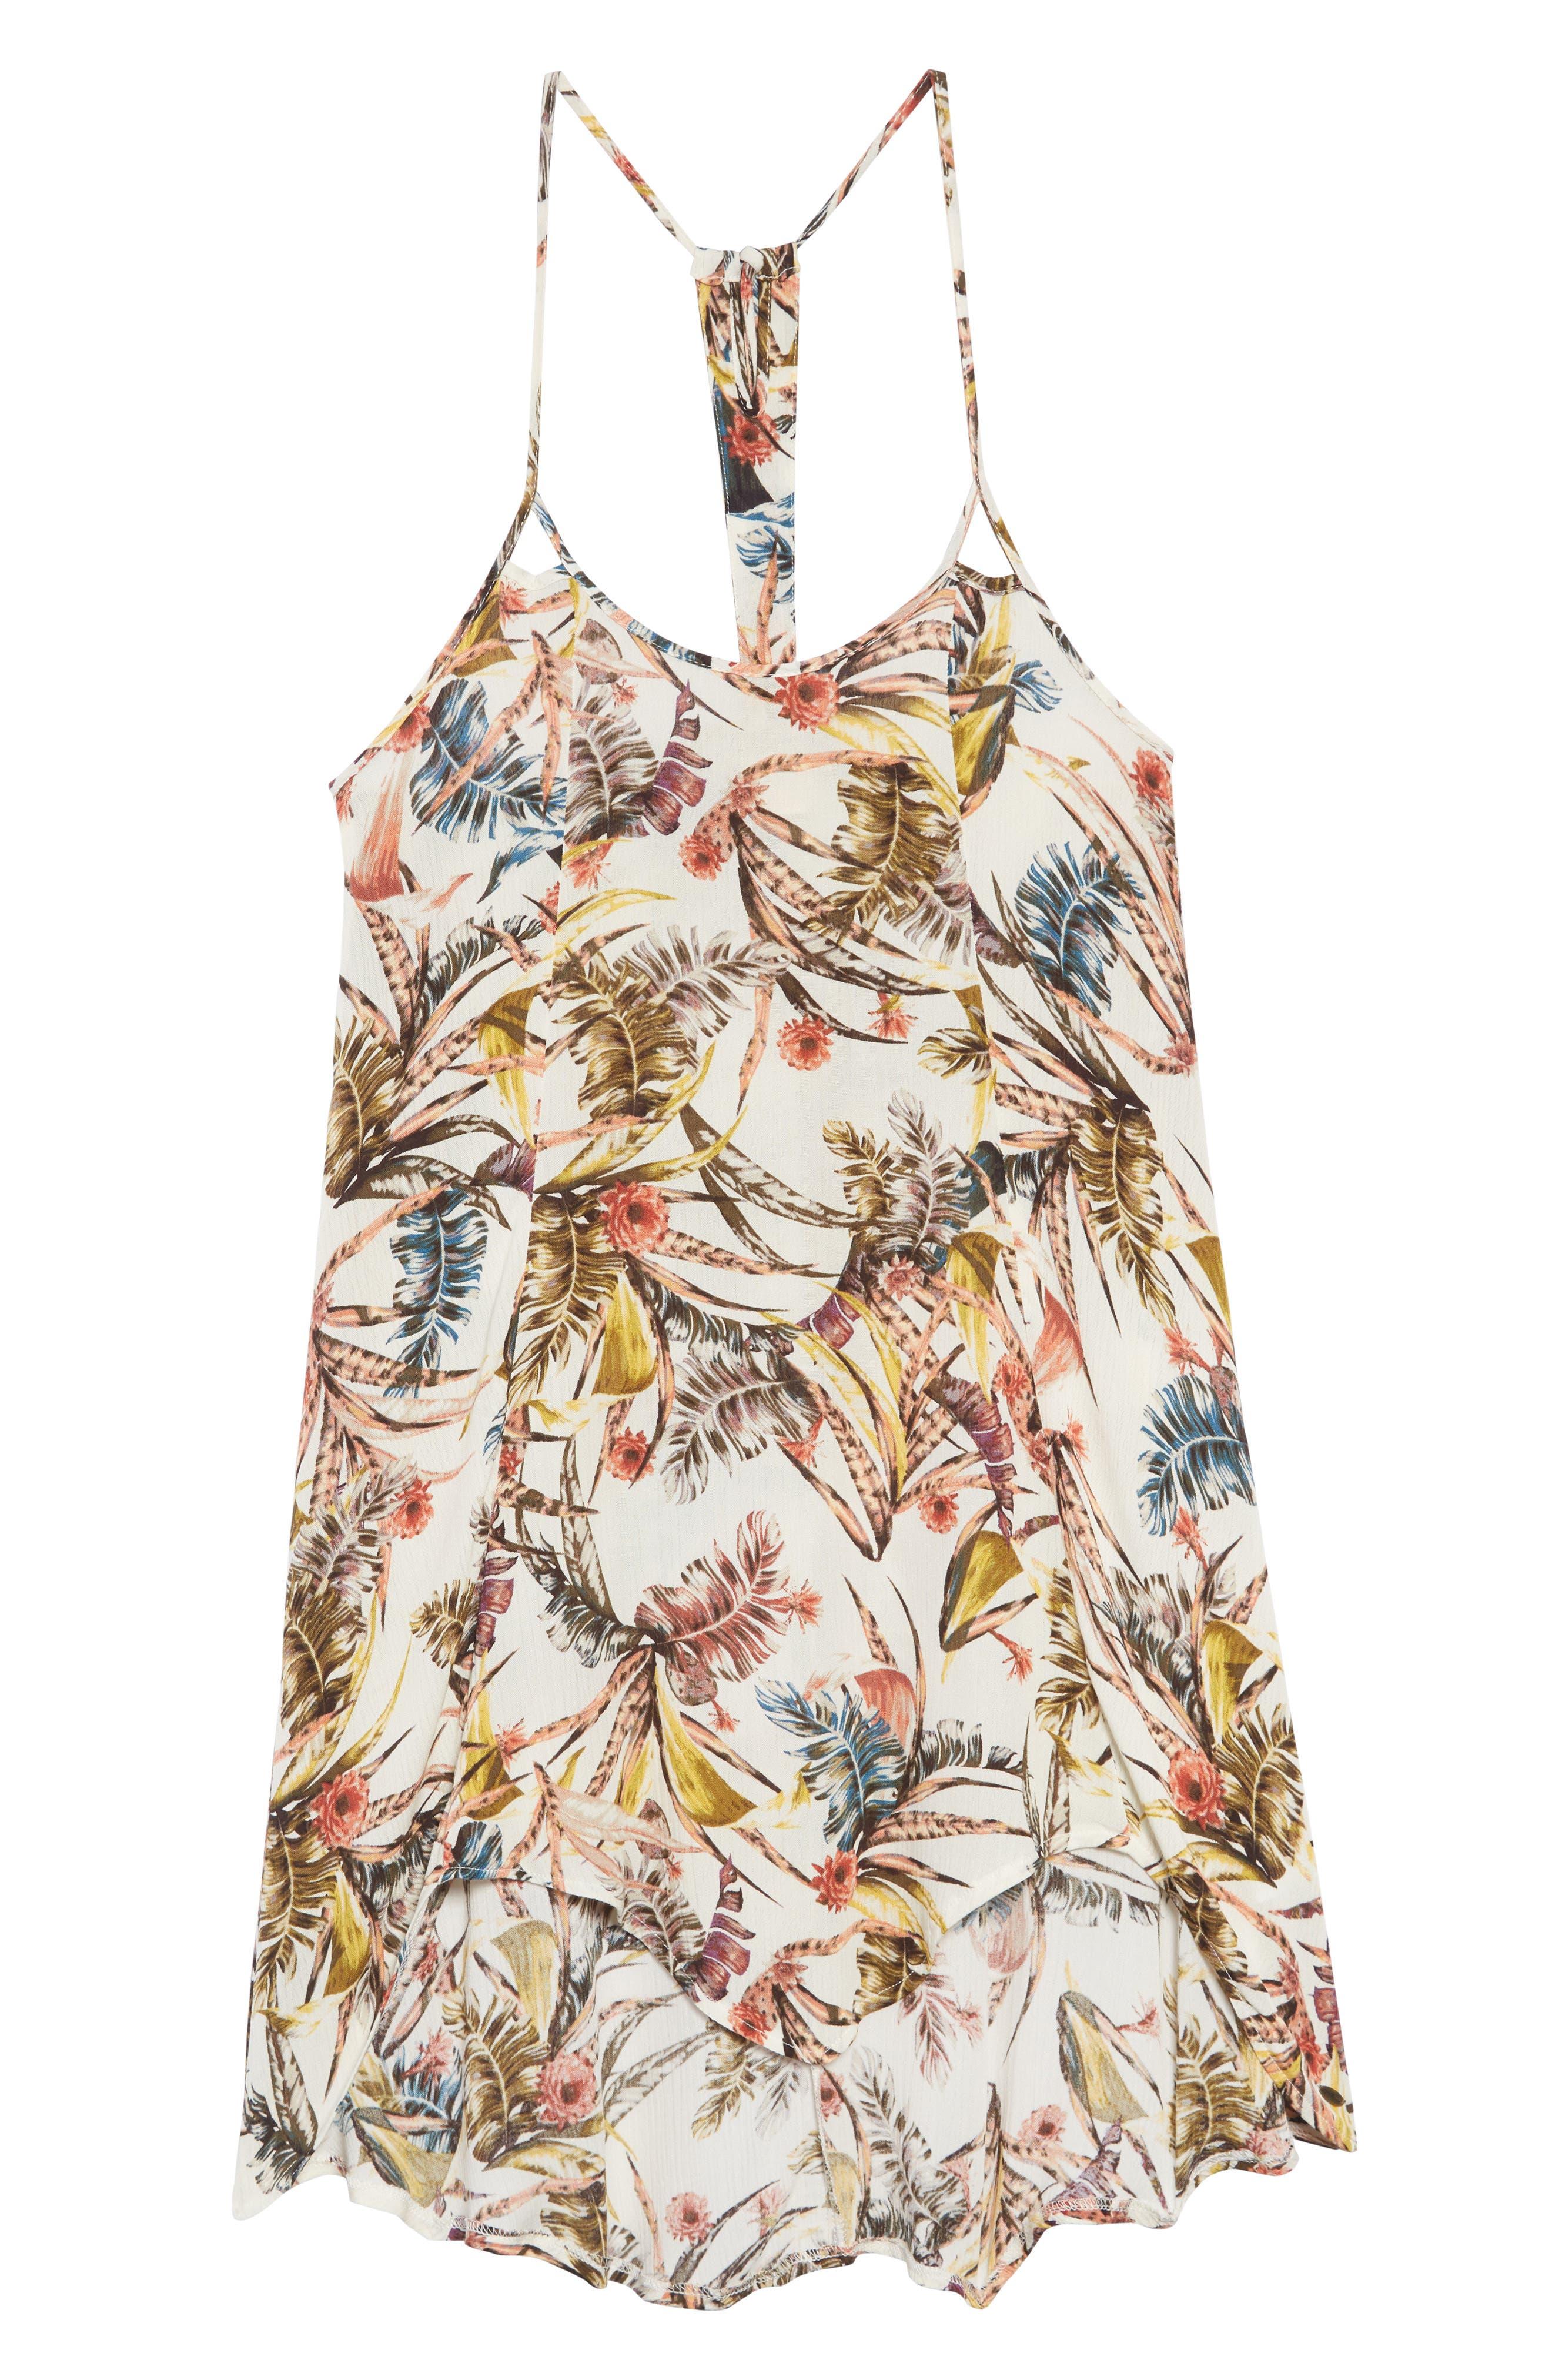 Dreamer Tropical Print Dress,                             Main thumbnail 1, color,                             250